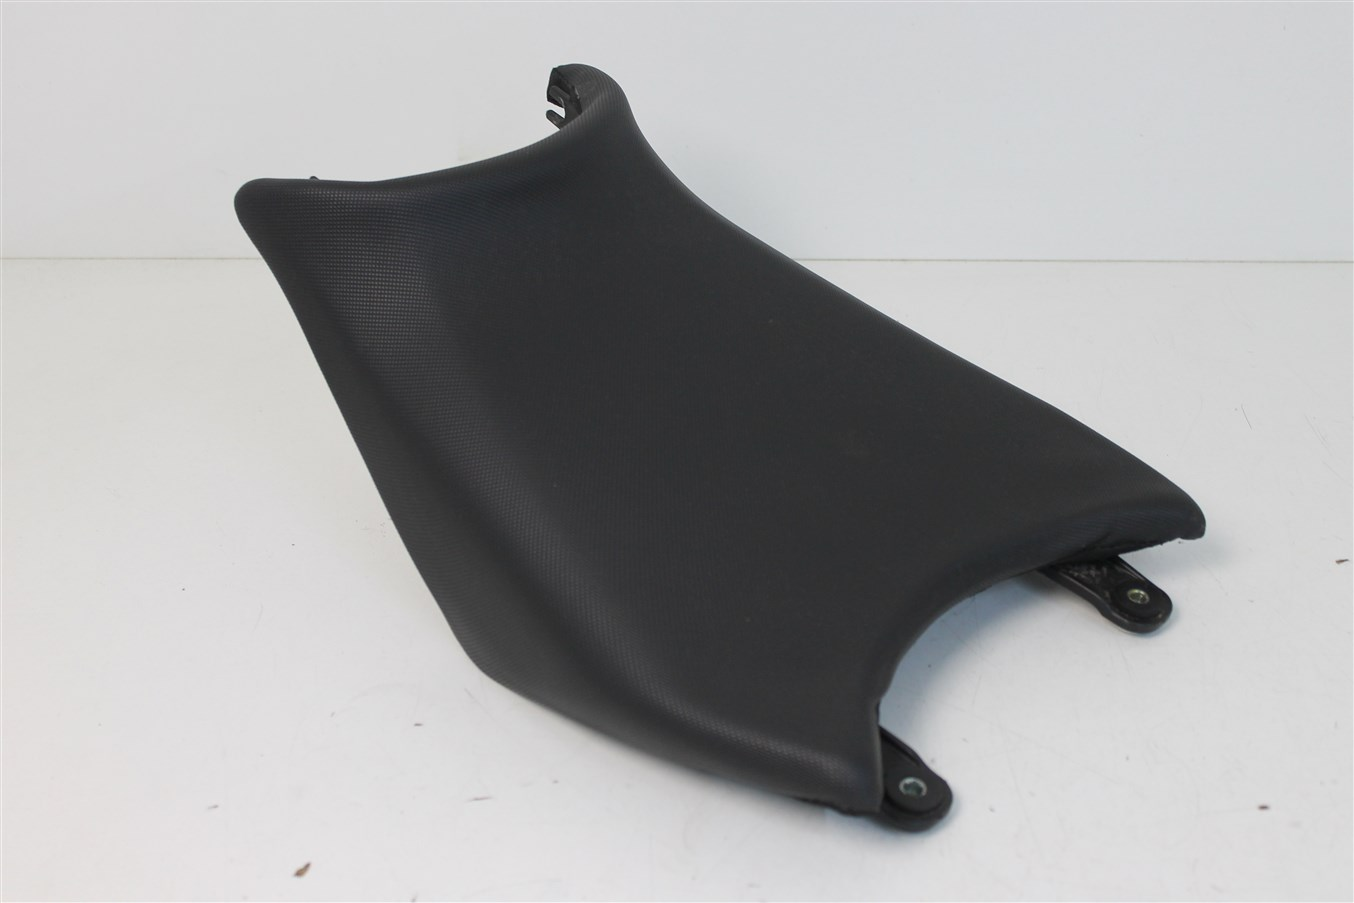 ktm duke 125 sitz sitzbank soloseat seat ab 2011 ebay. Black Bedroom Furniture Sets. Home Design Ideas